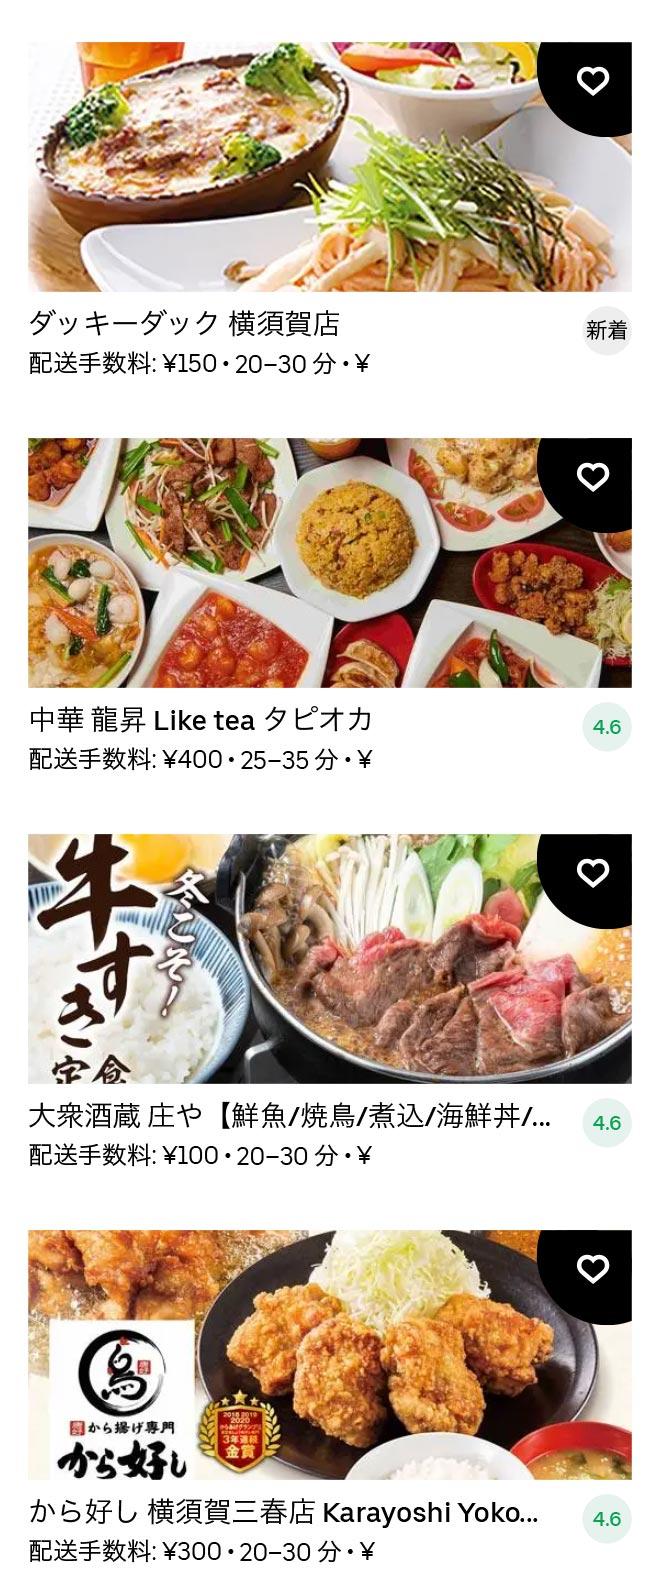 Yokosuka chuo menu 2011 11